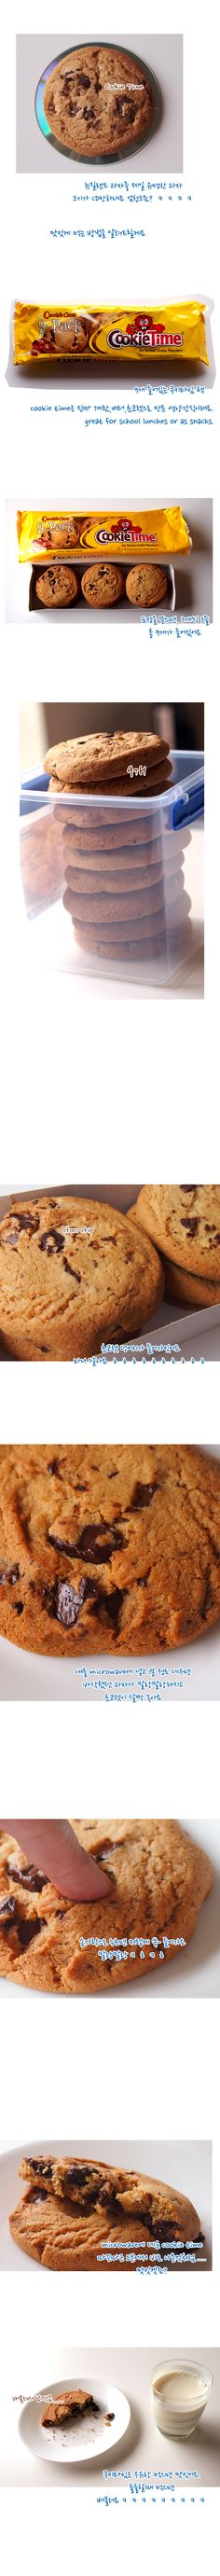 NZ's favorite cookie, Cookie Time